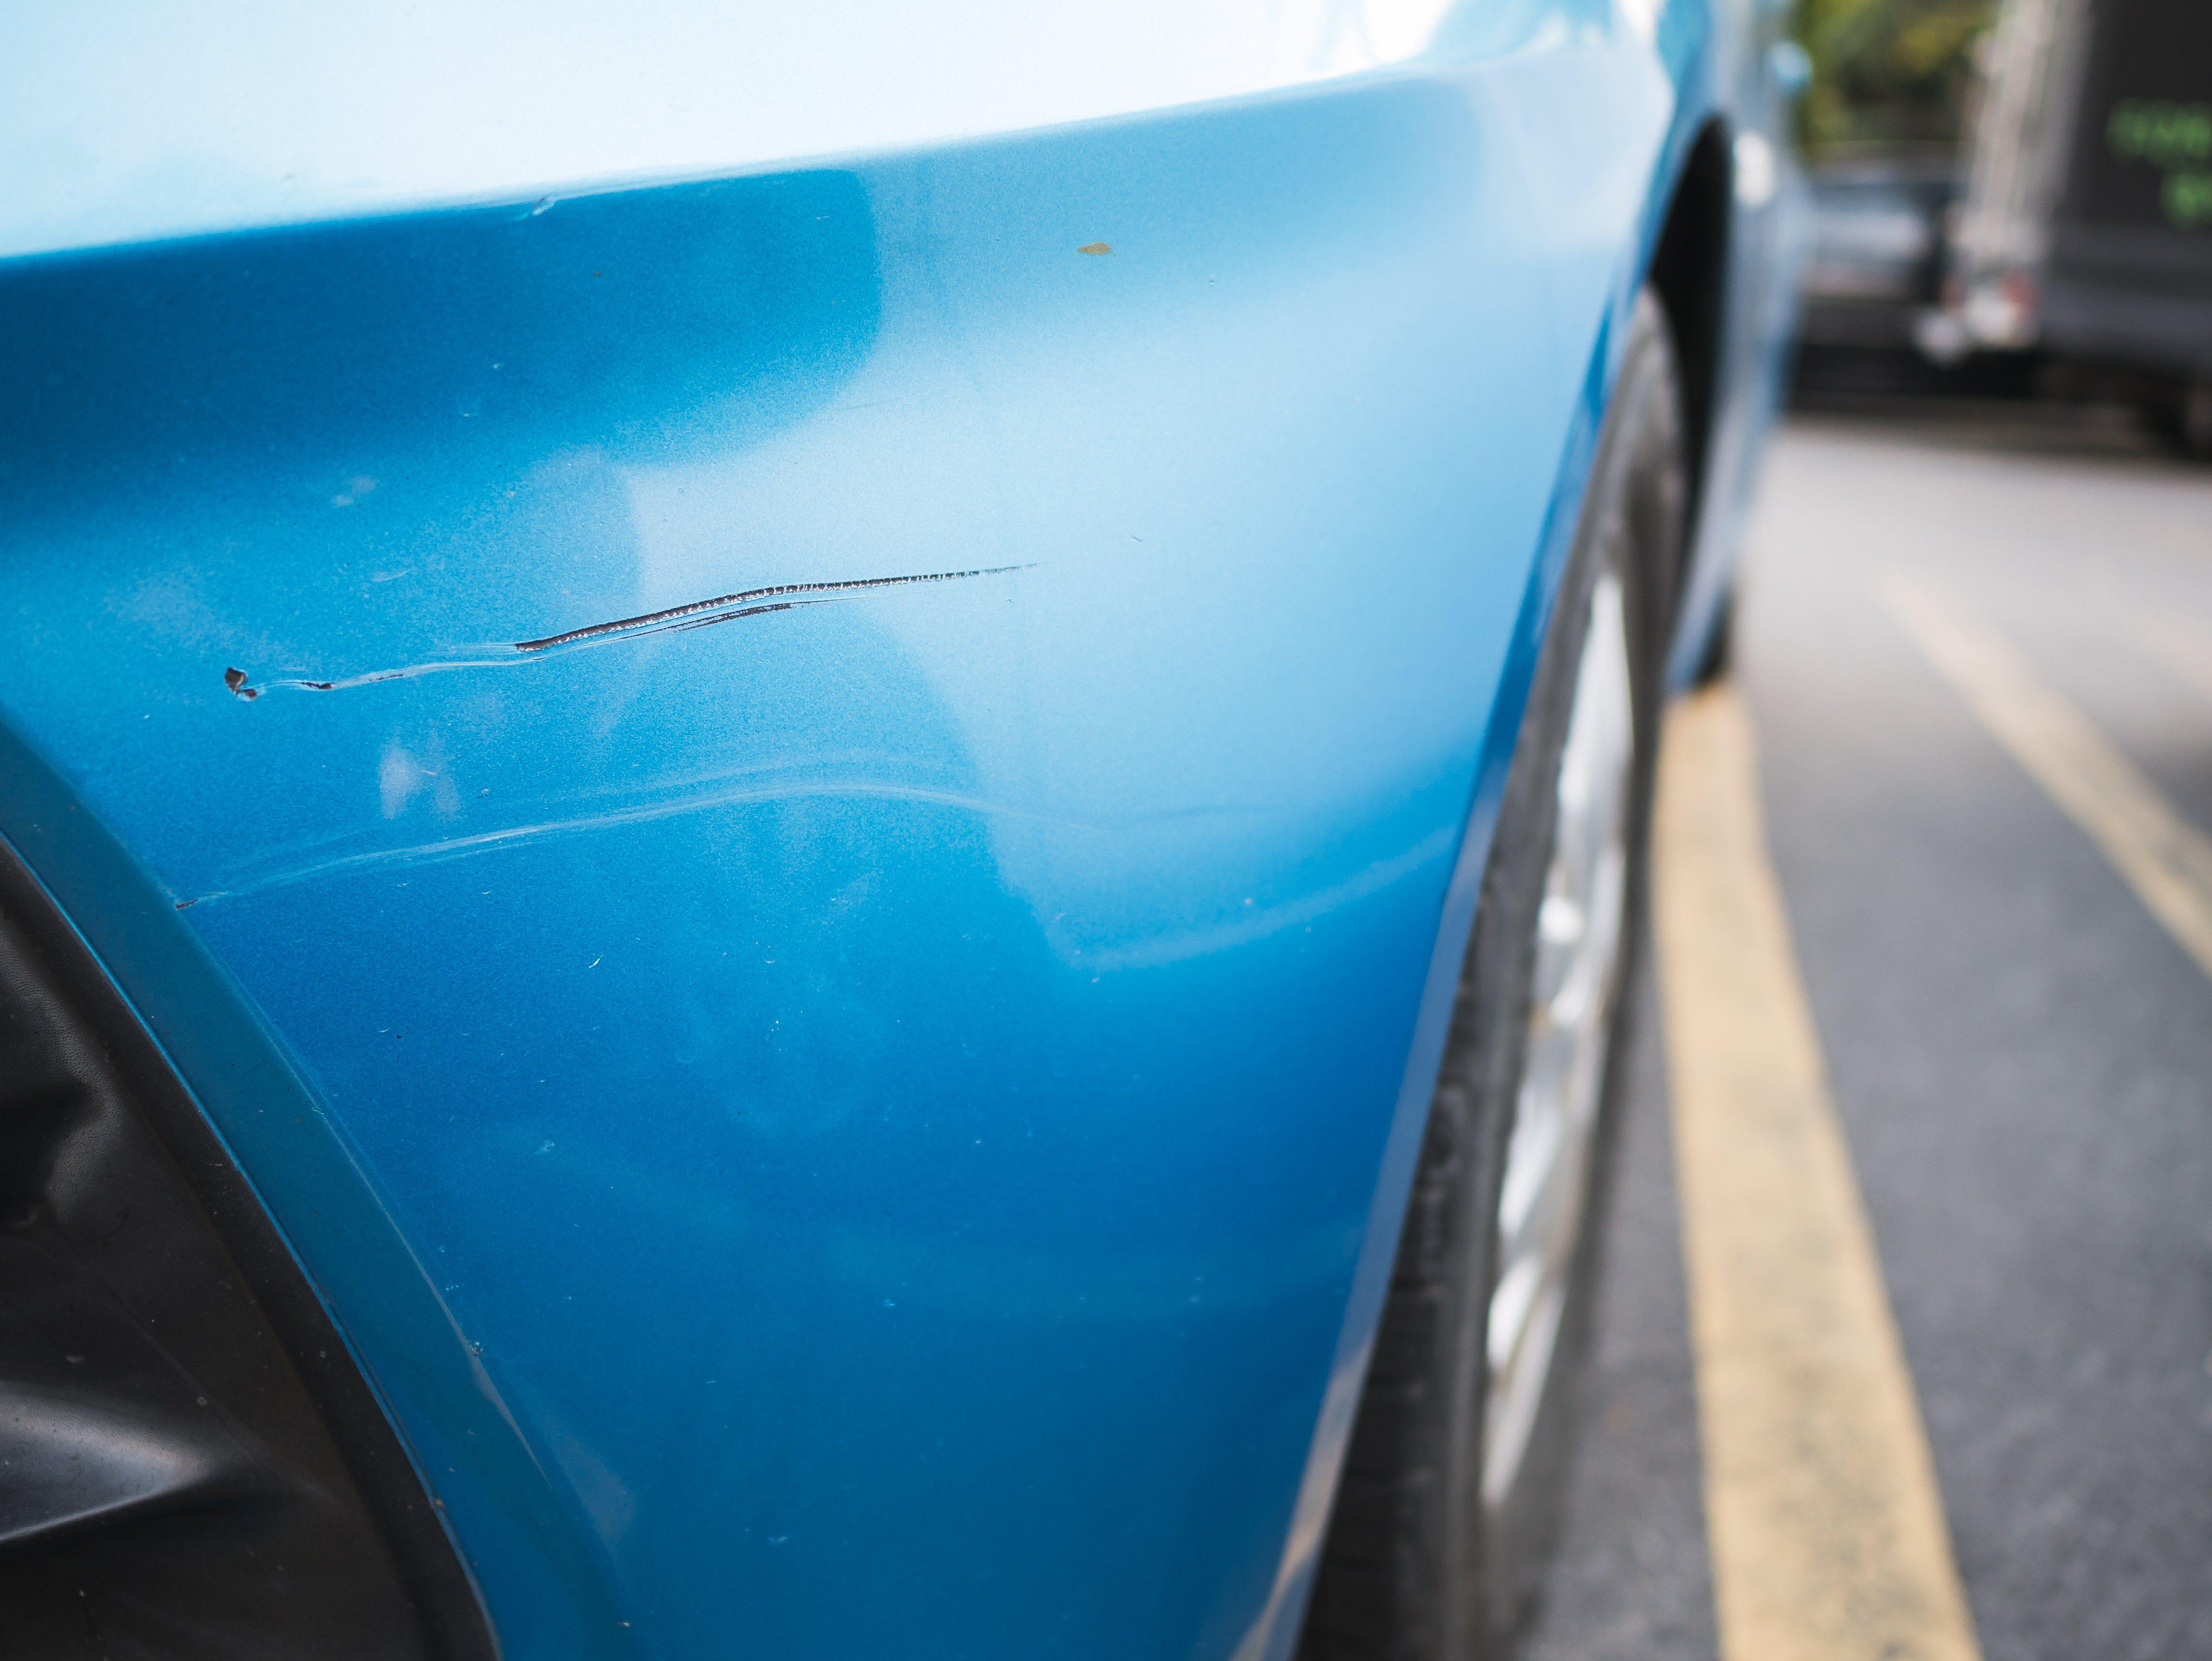 Scratch on the blue car